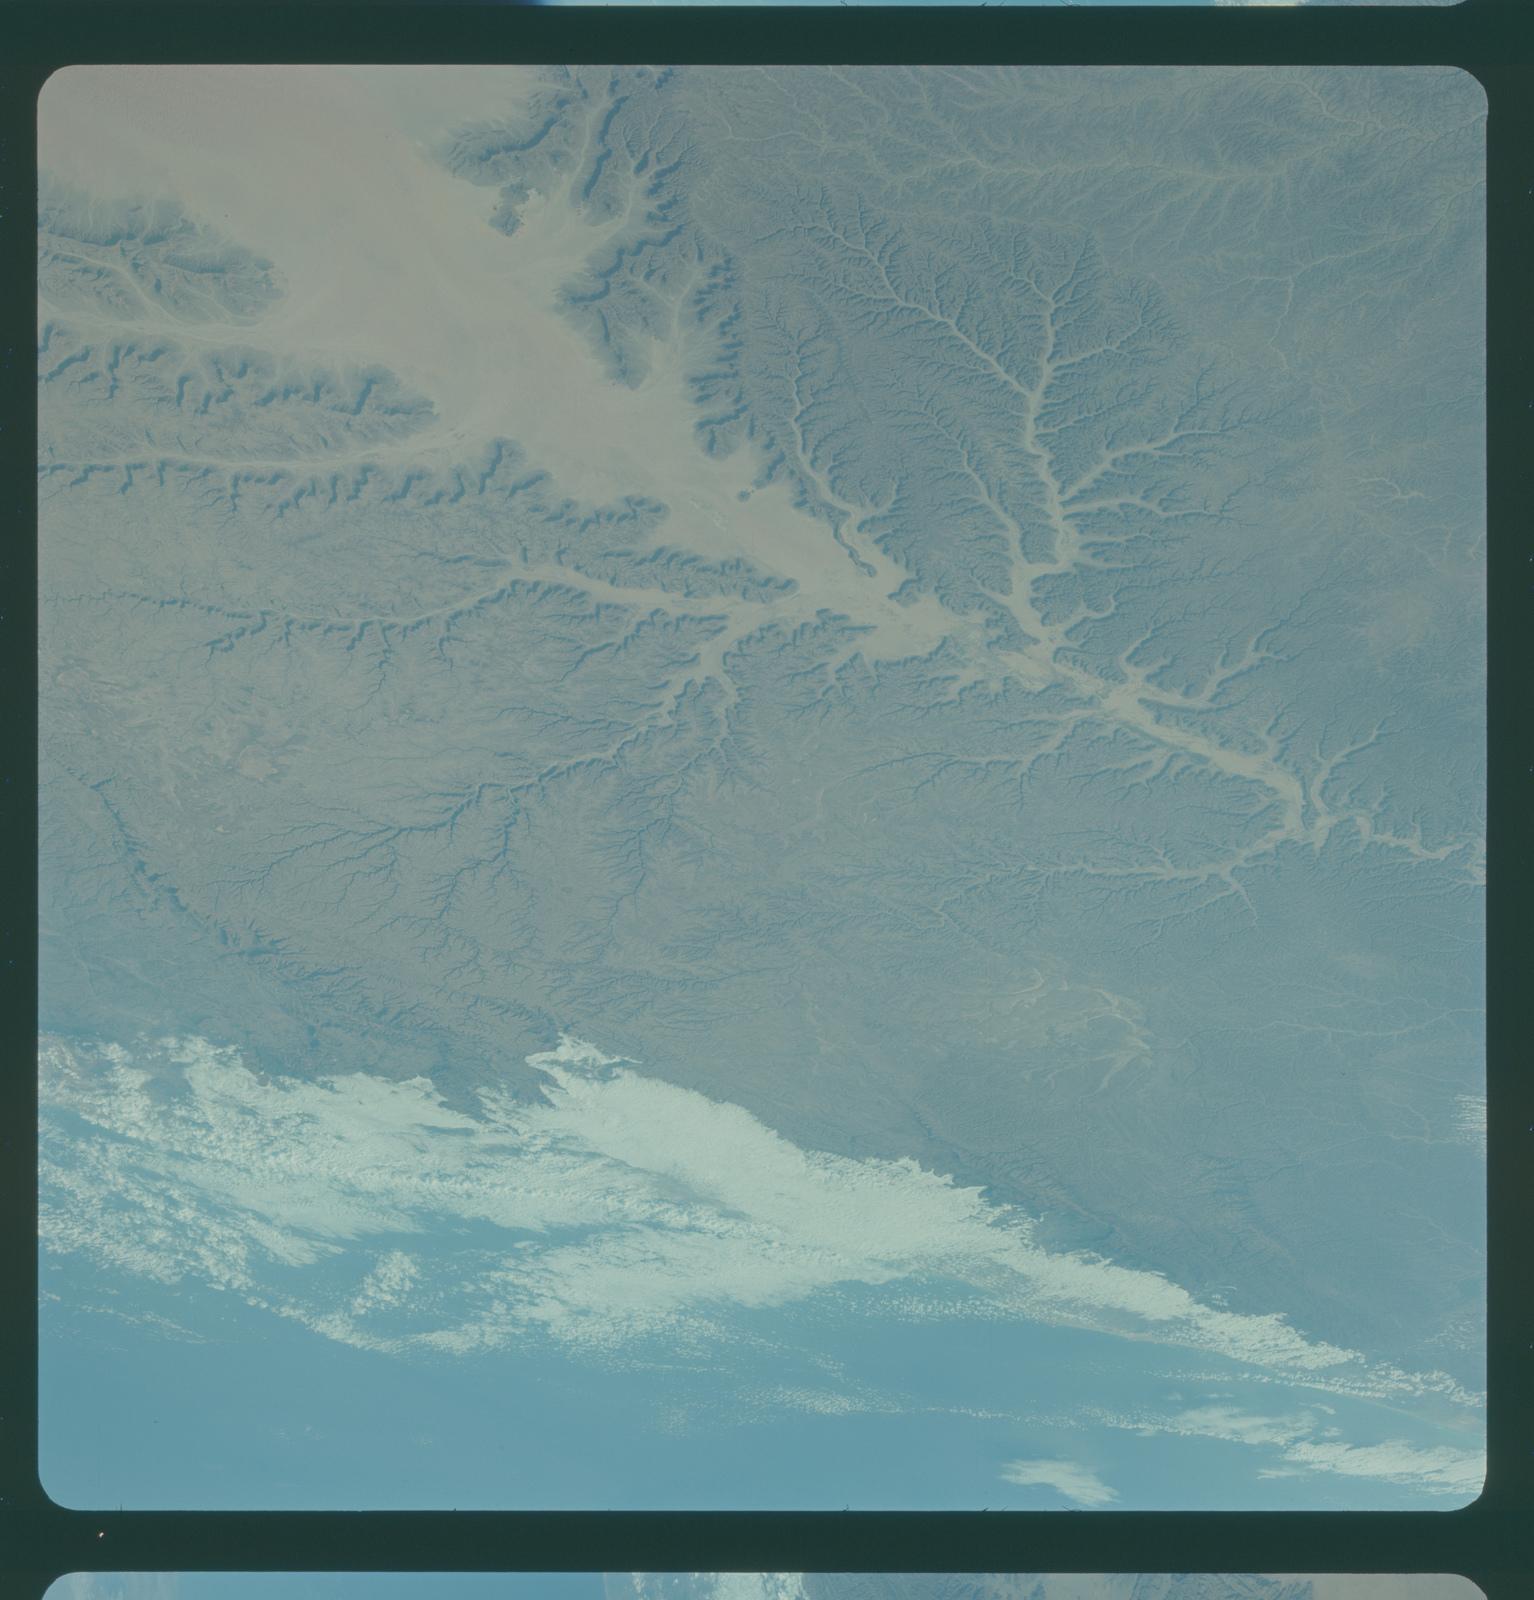 Gemini IV Mission Image -  South Arabia; Gulf of Aden; Wadi Hadramawt